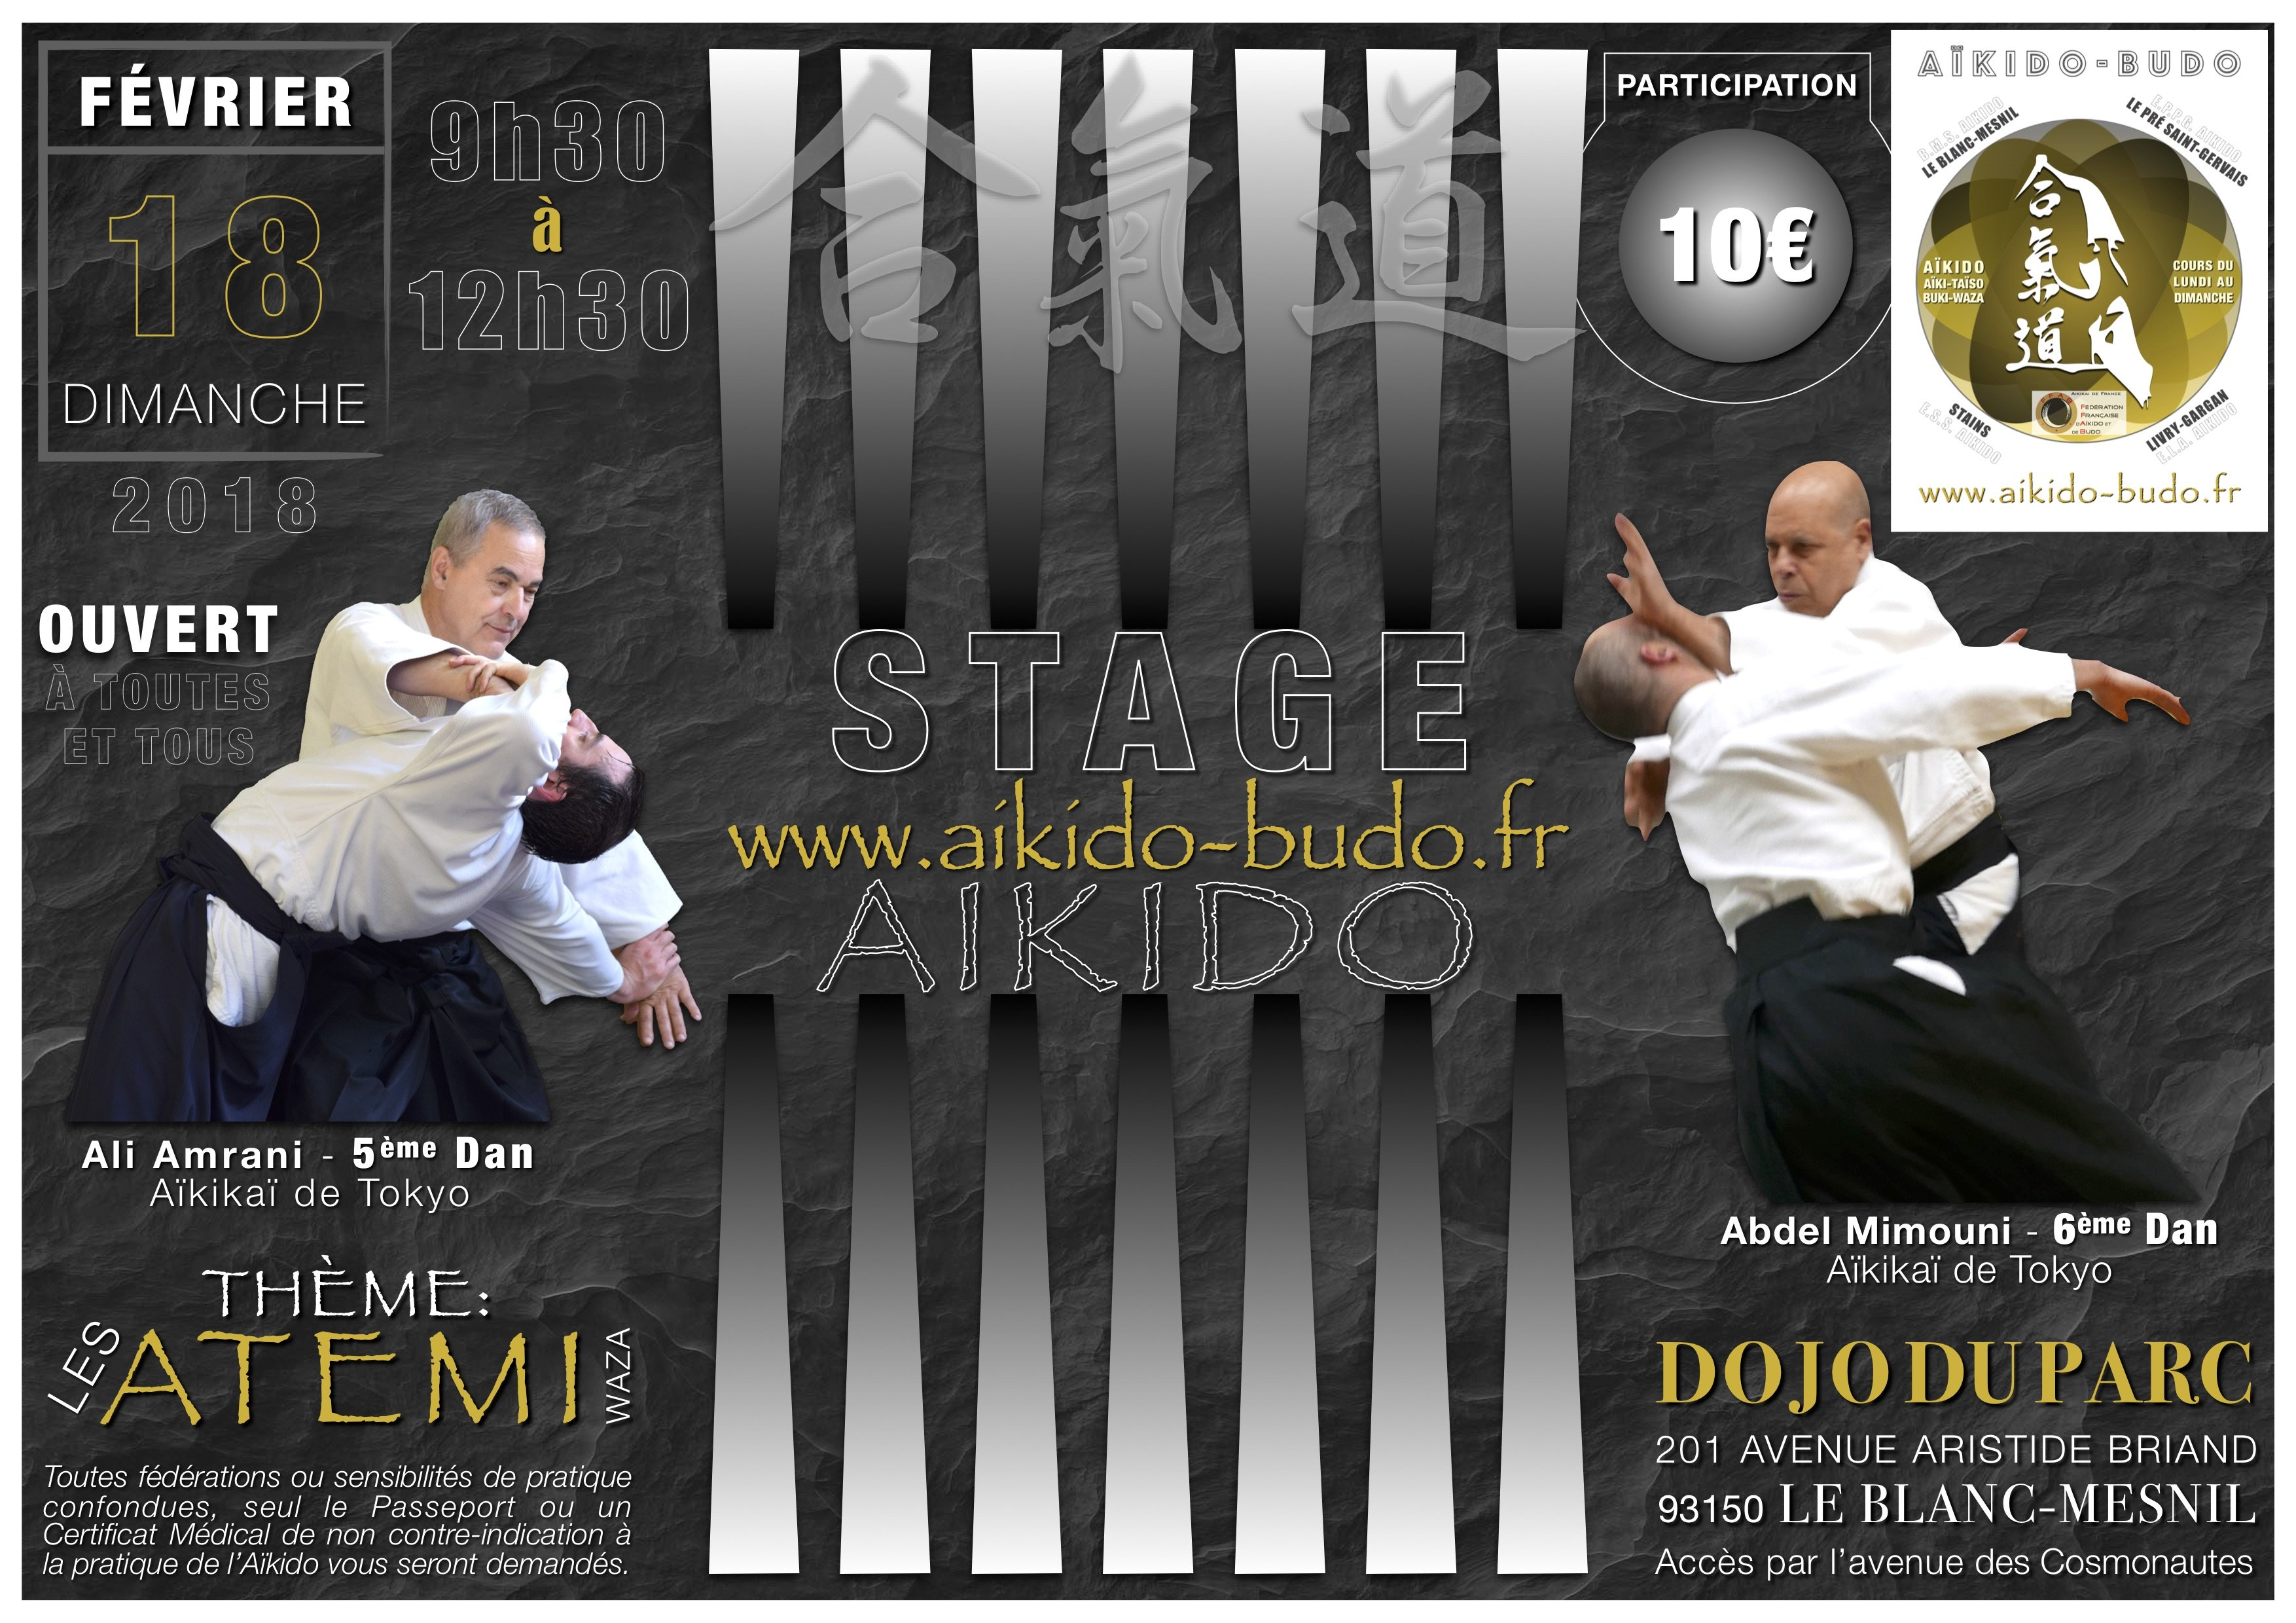 AIKIDO - STAGE - LES ATEMI EN AIKIDO - 18/02/2018